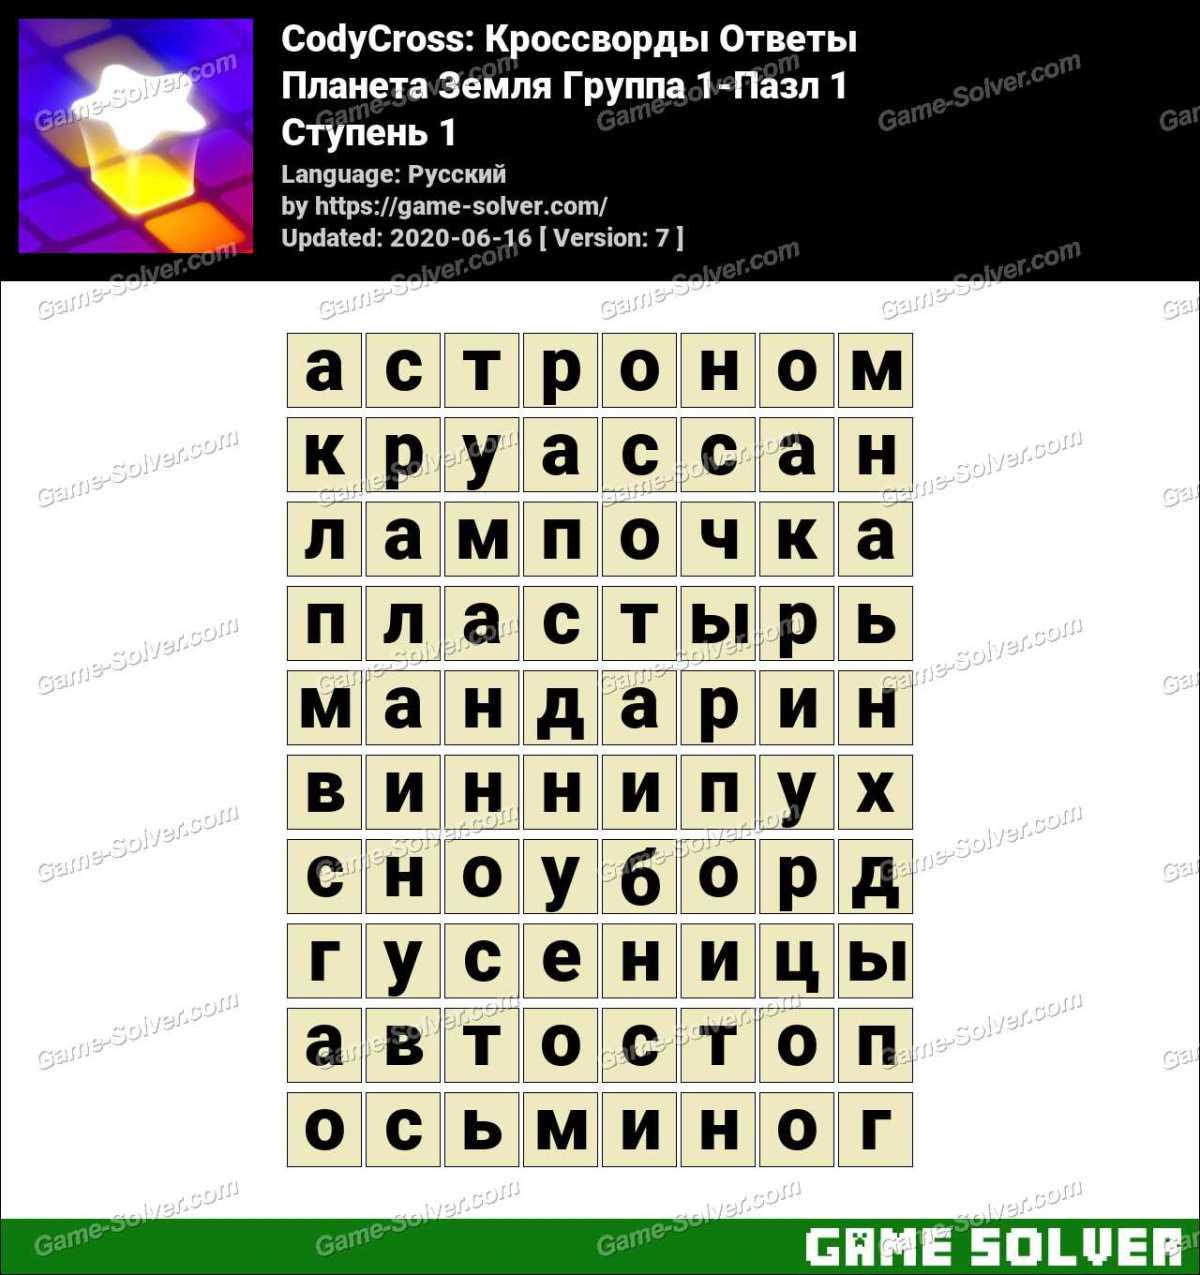 CodyCross Планета Земля Группа 1-Пазл 1 Ответы